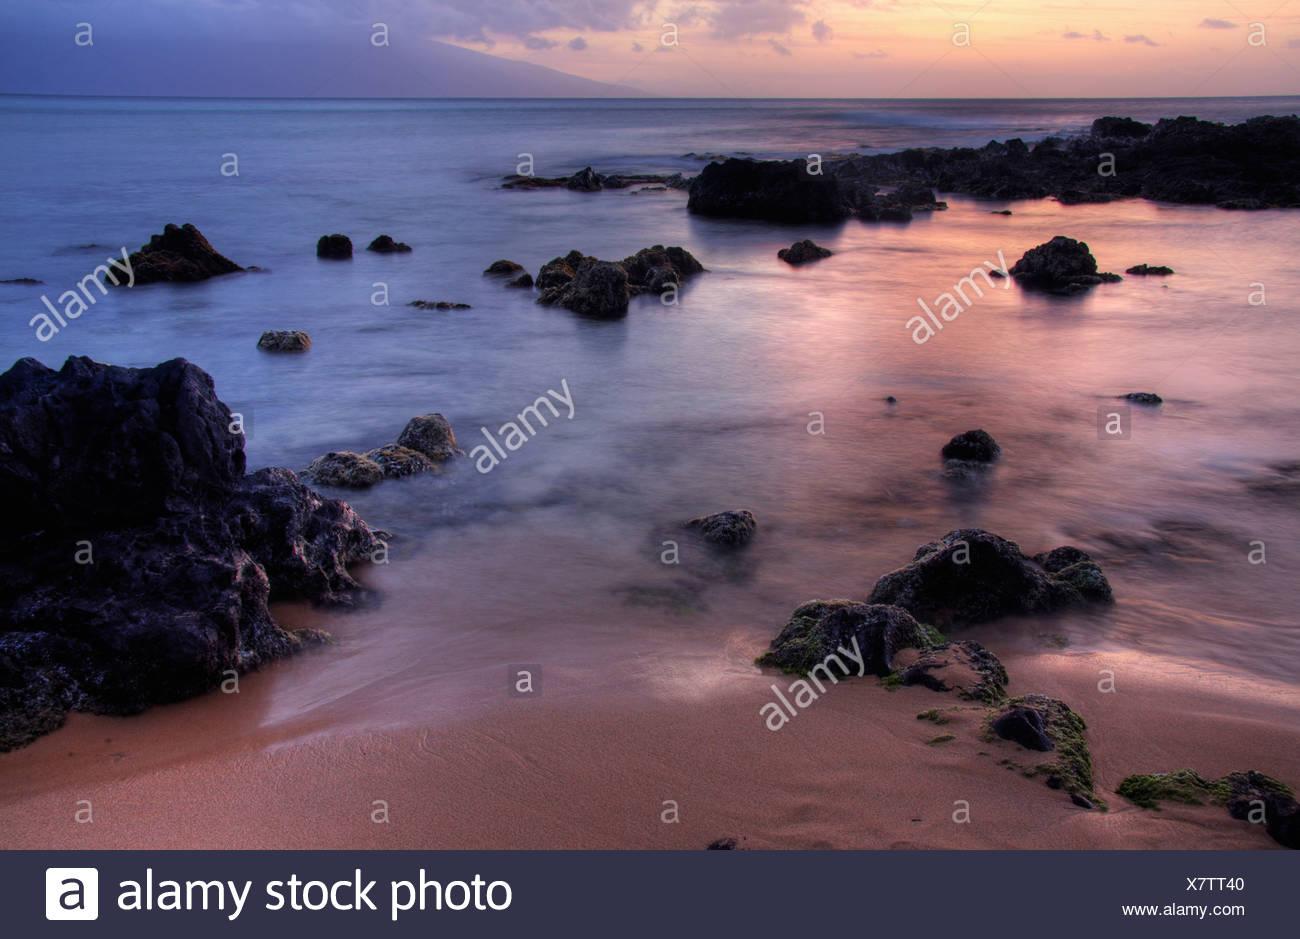 Mixed hues and warm tones on the beach at sunset, Maui, Hawaii - Stock Image